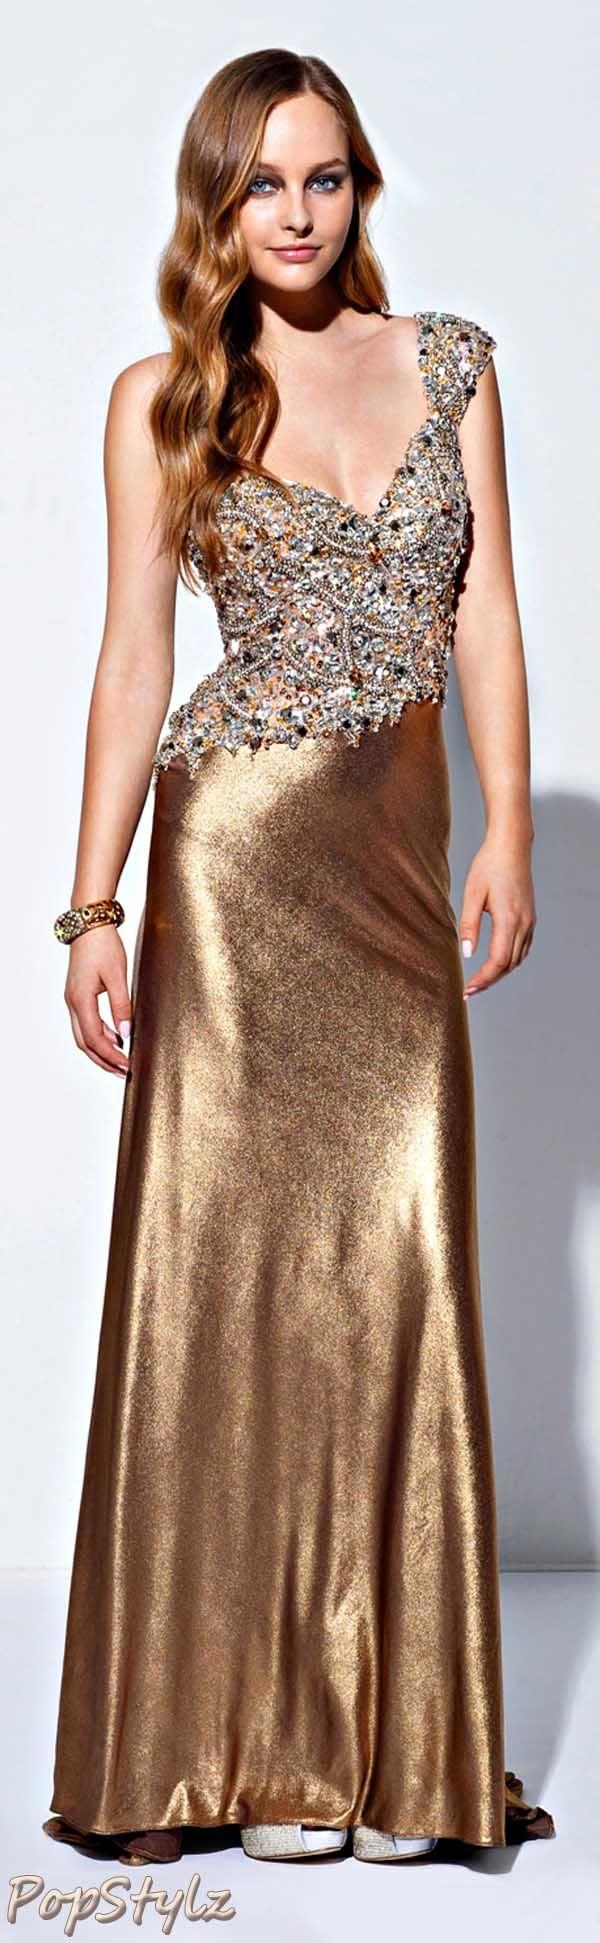 Gold strike drank cocktail dress